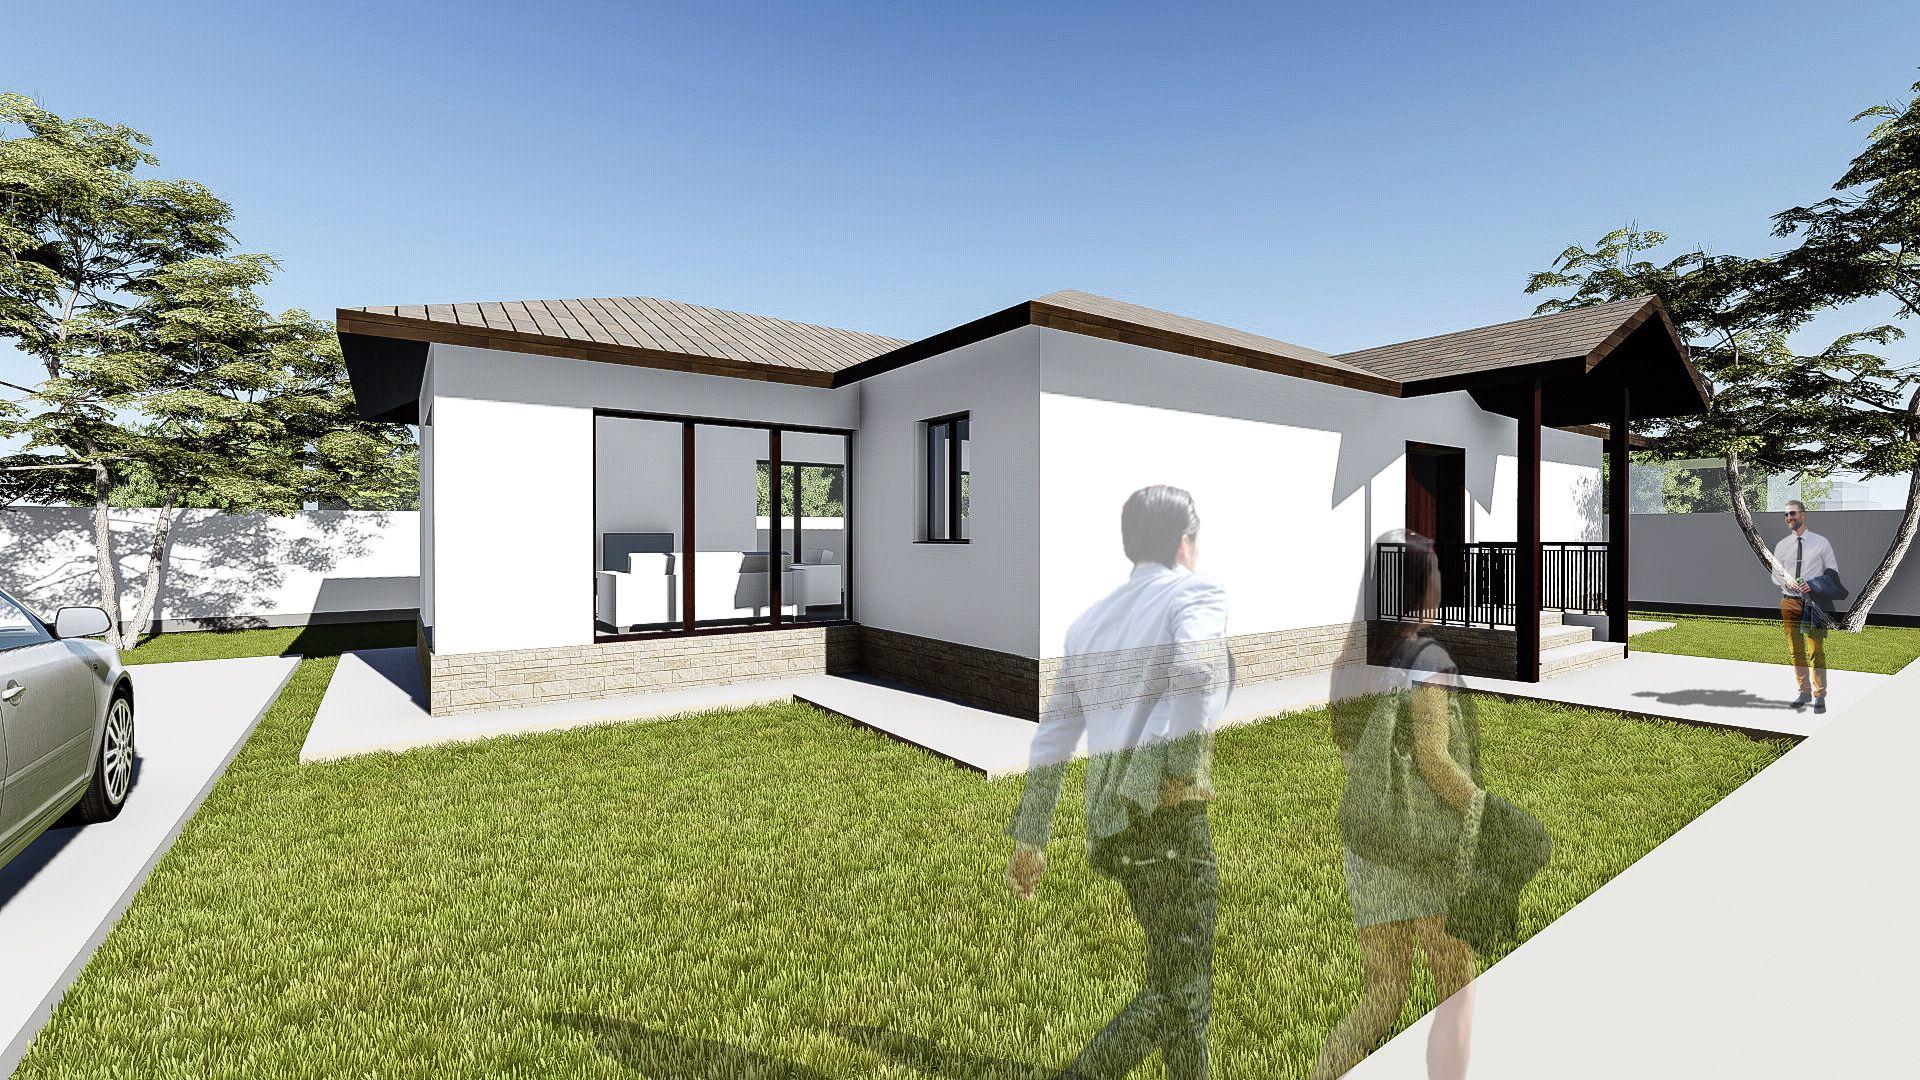 Proiect casa lumis parter 3 camere 104mp mai multe for Case parter 3 camere